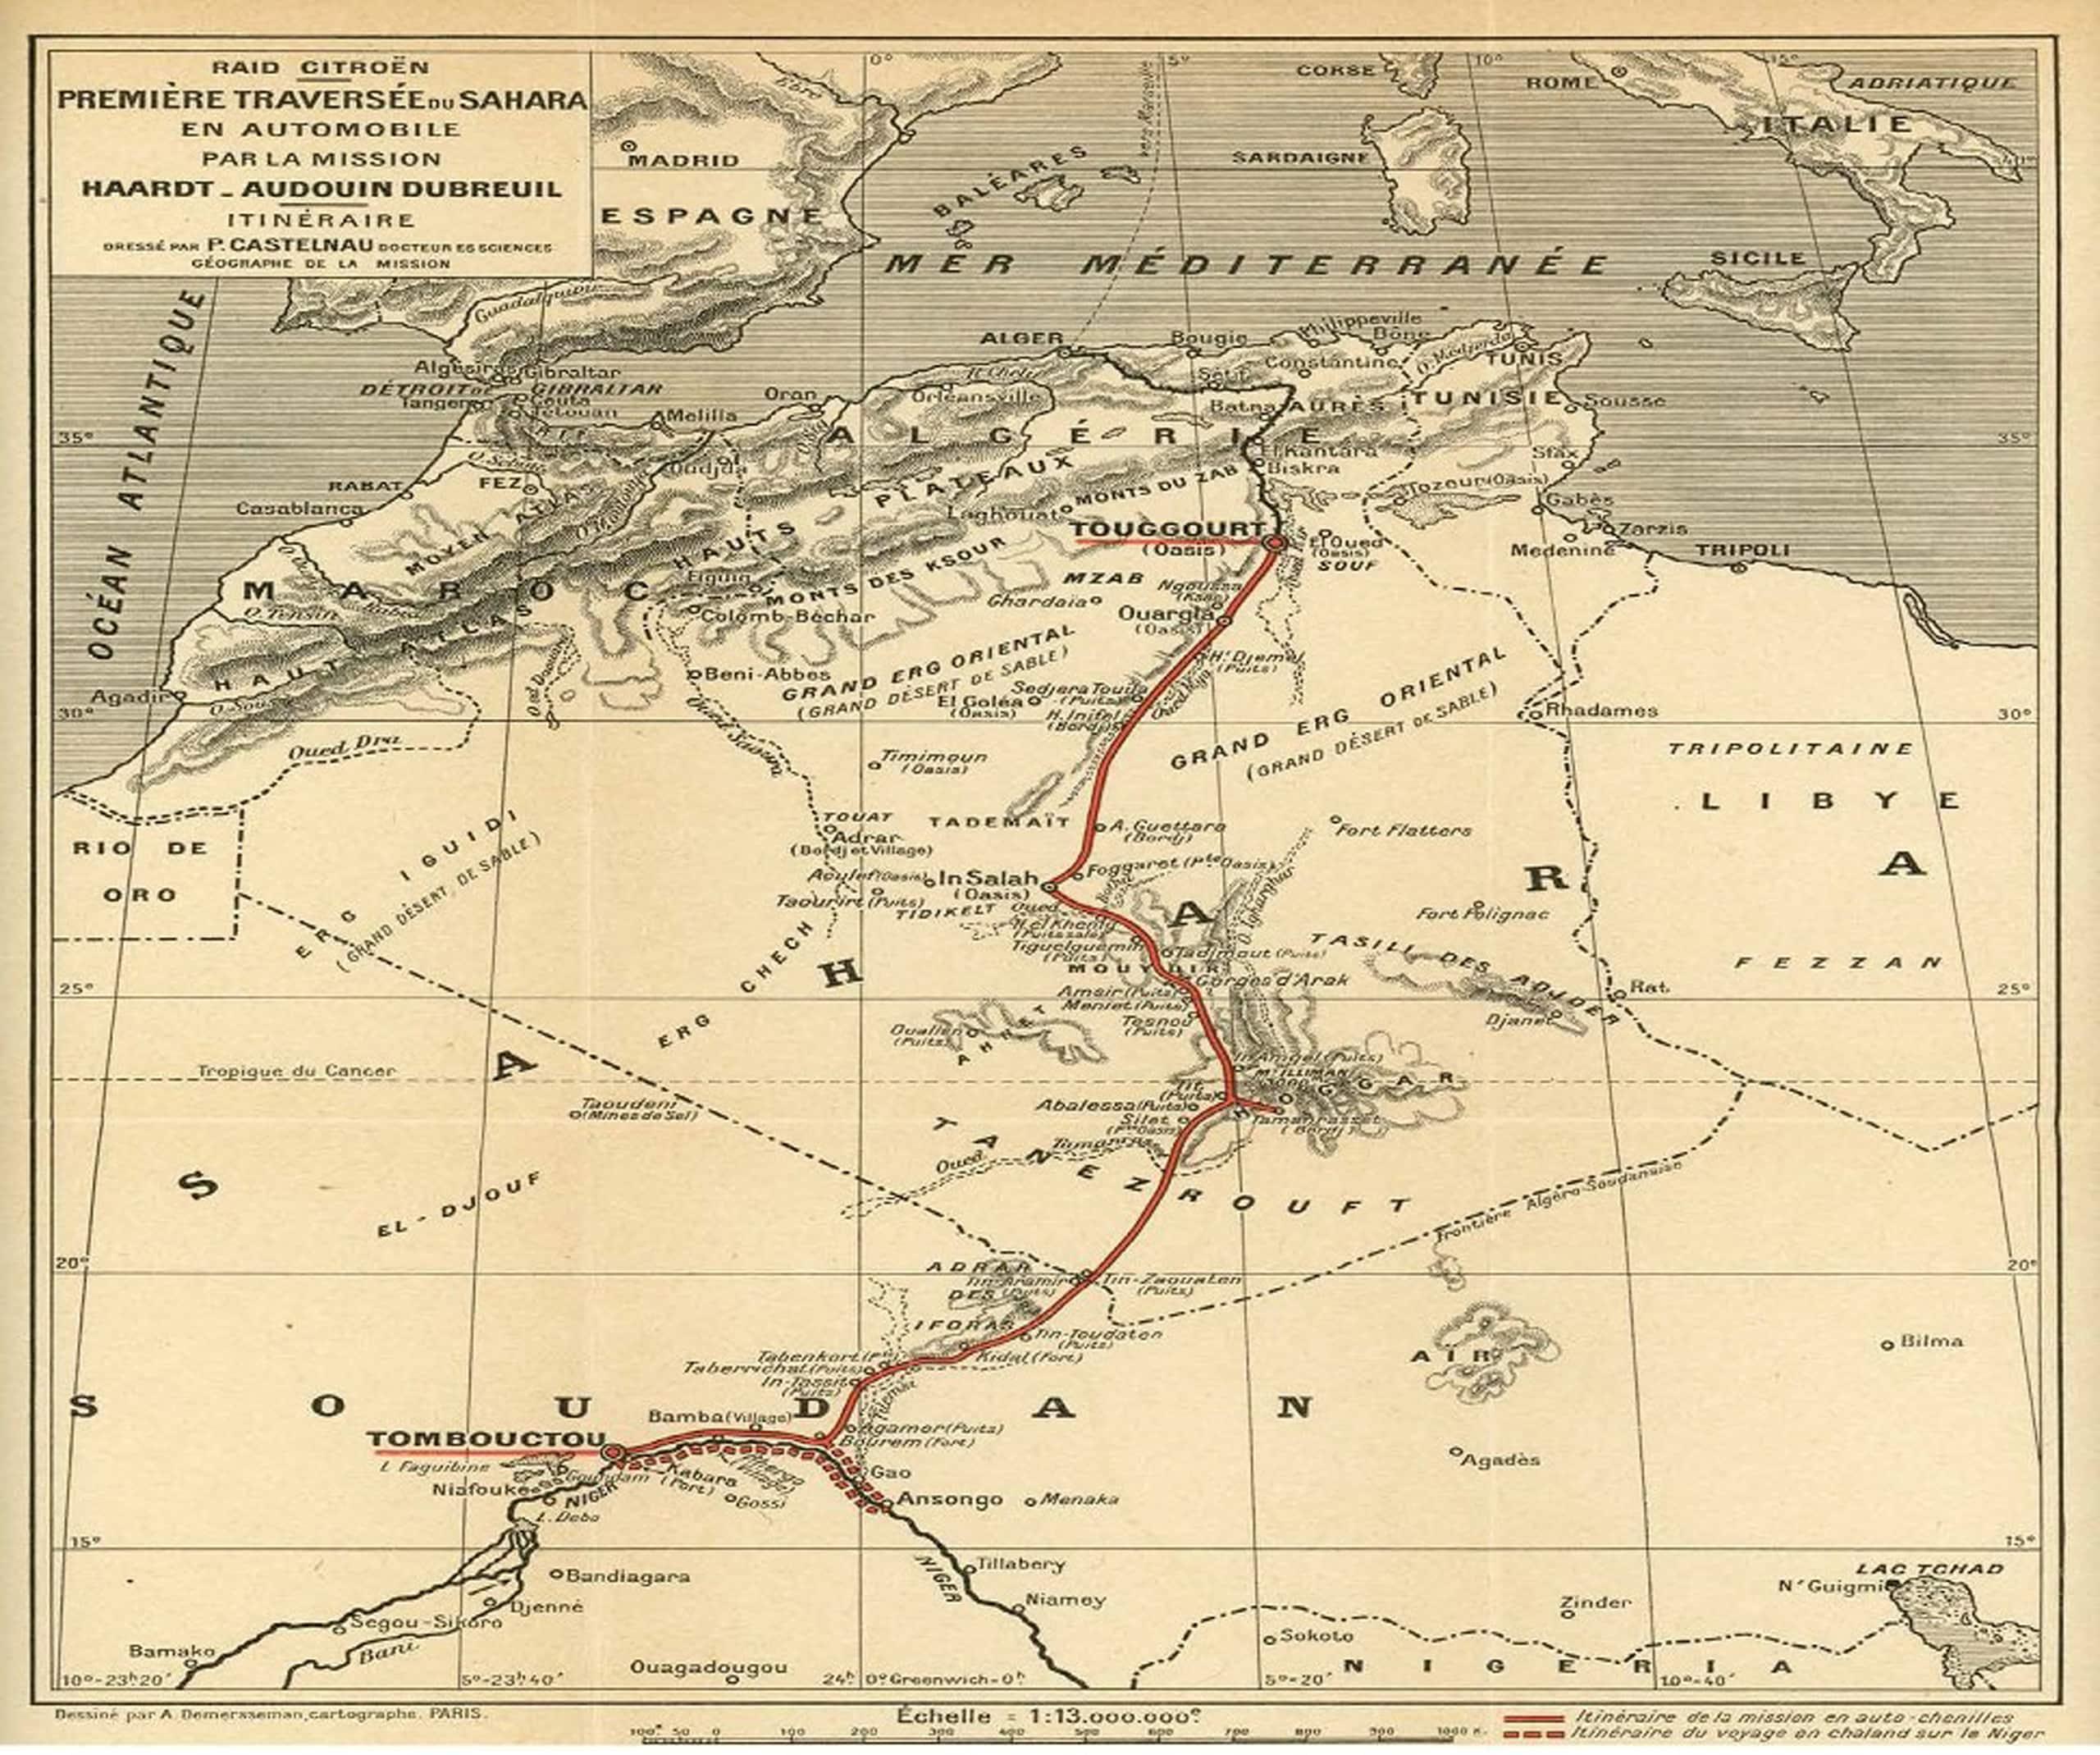 Citroen B2 Type: nel 1922 la traversata del Sahara FOTO